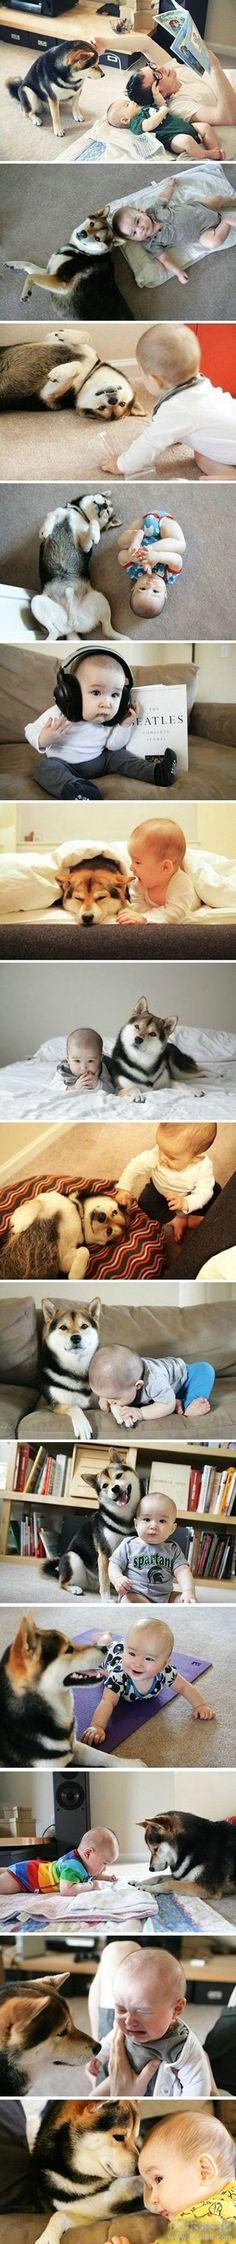 anim, friends, shiba inu, pet, future babies, children, baby dogs, puppi, kid